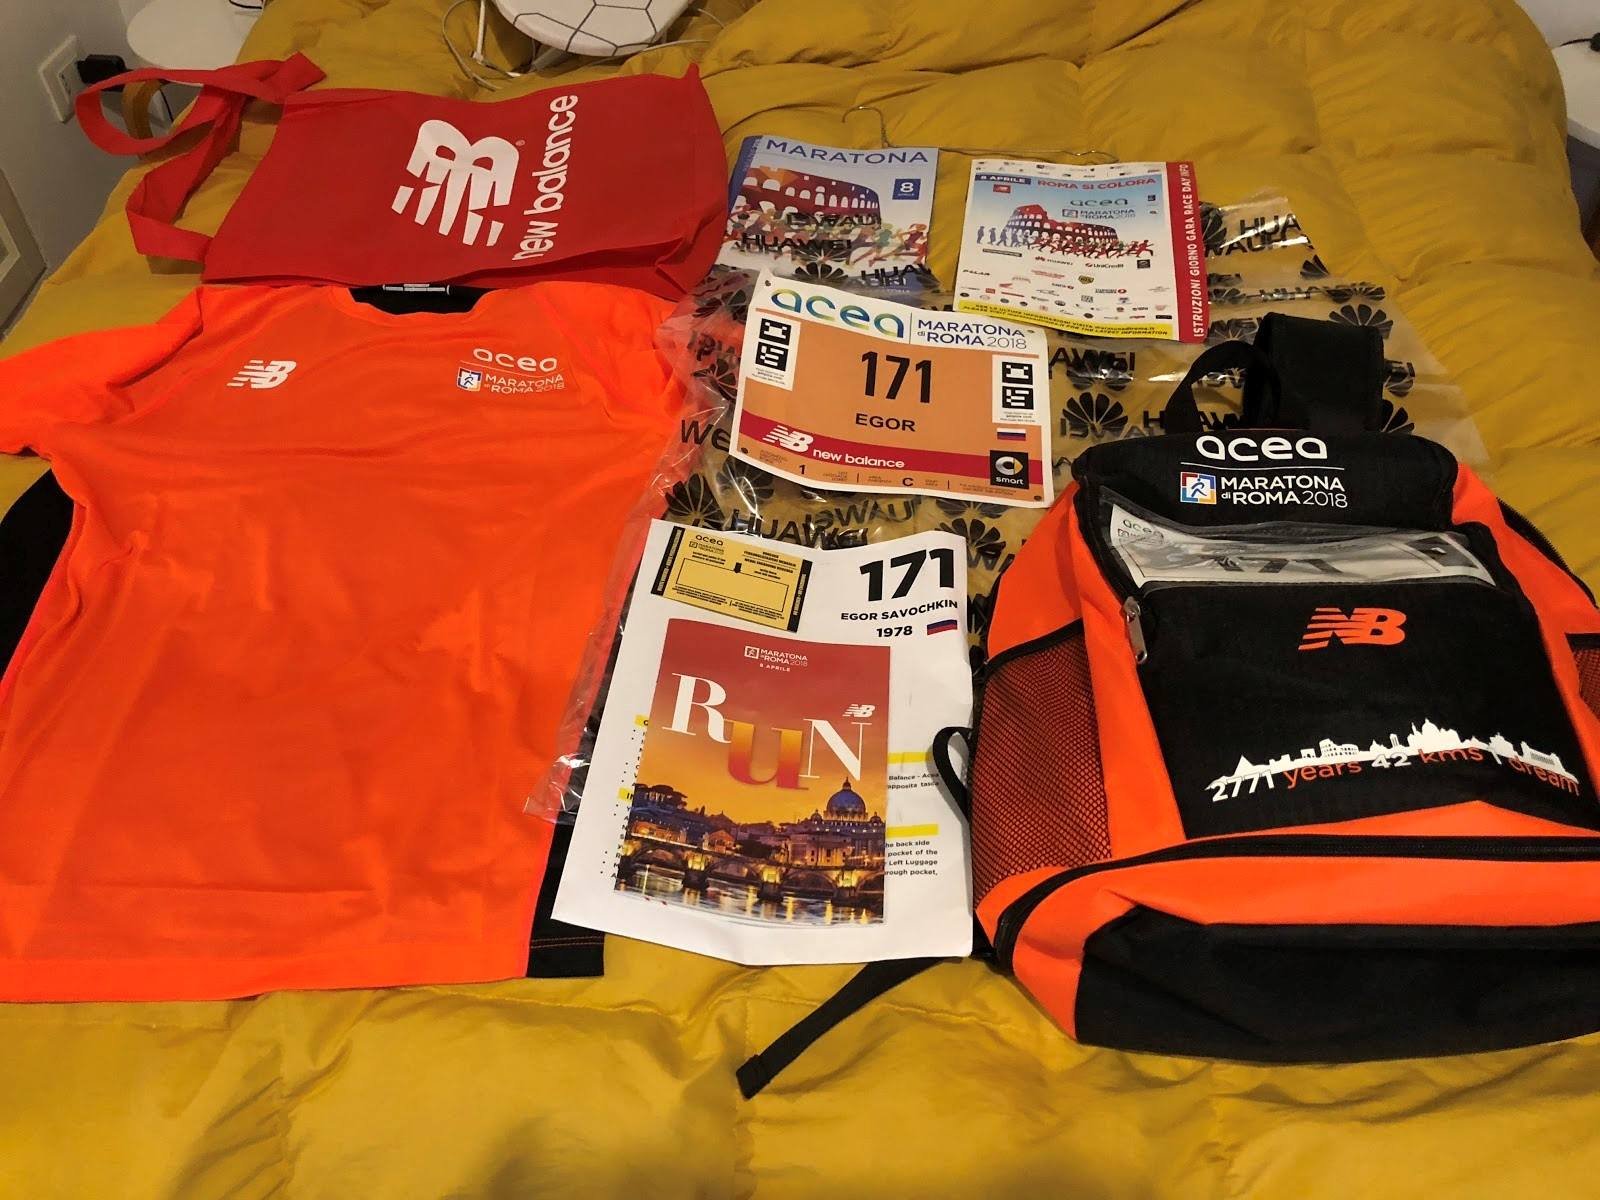 [Хабра-оффтоп] Maratona di Roma, или первый марафон для ИТ-шника - 13